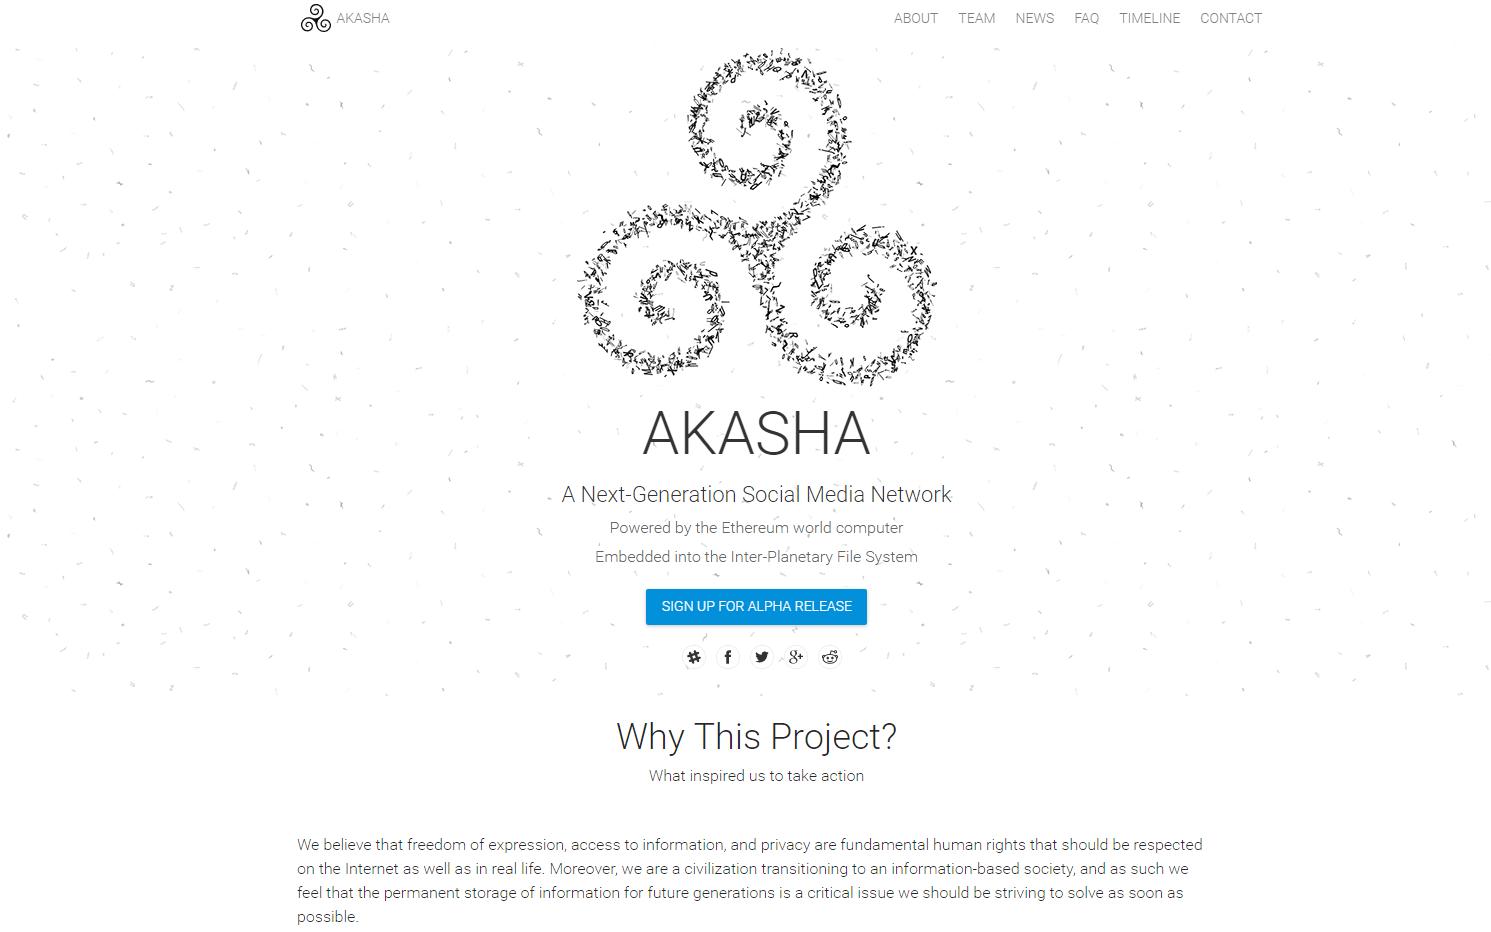 ashaka 仮想通貨